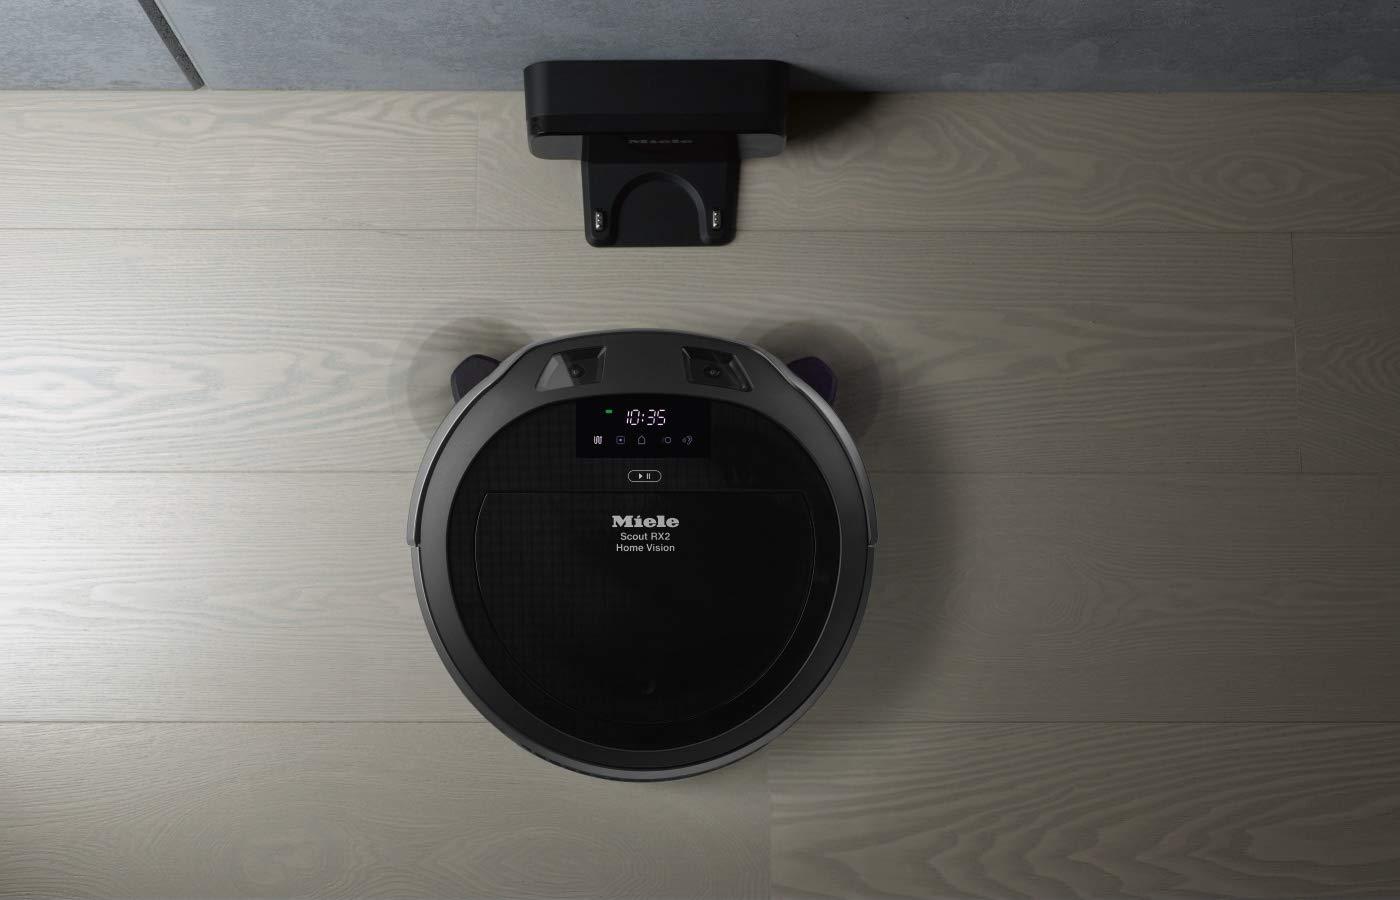 Miele aspiradora Scout RX2 Home Vision negro/gris/antracita 0.5 litro: Amazon.es: Hogar